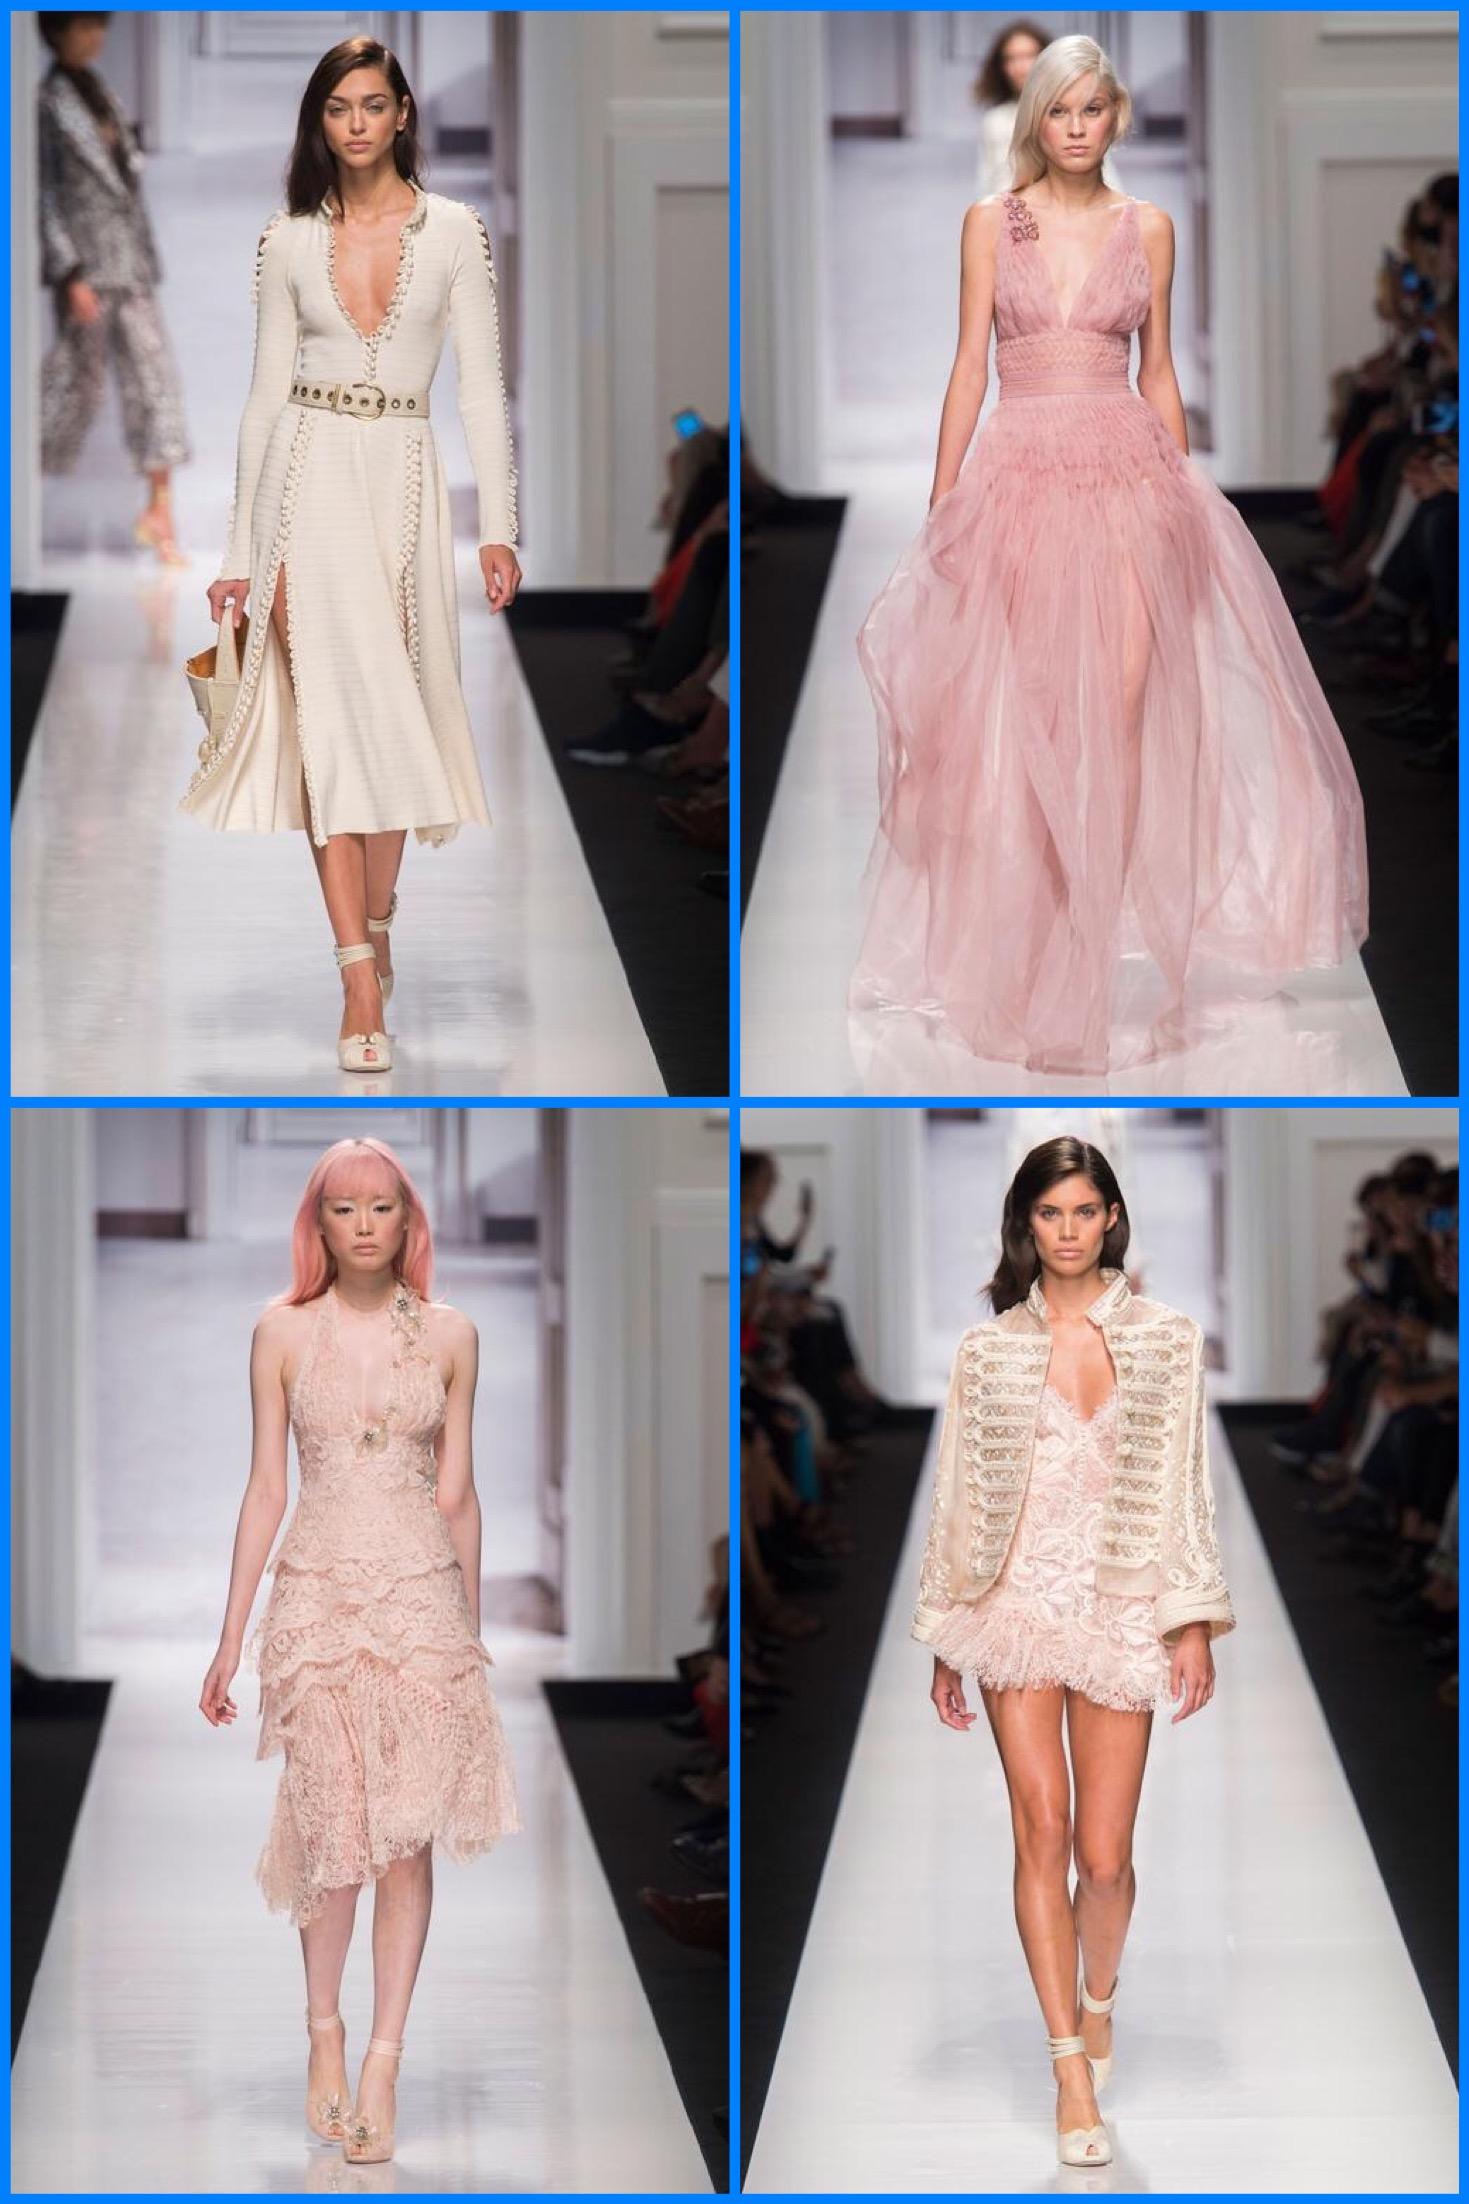 milano-fashion-week-pret-a-porter-spring-summer-2017-style-simonetta-ravizza